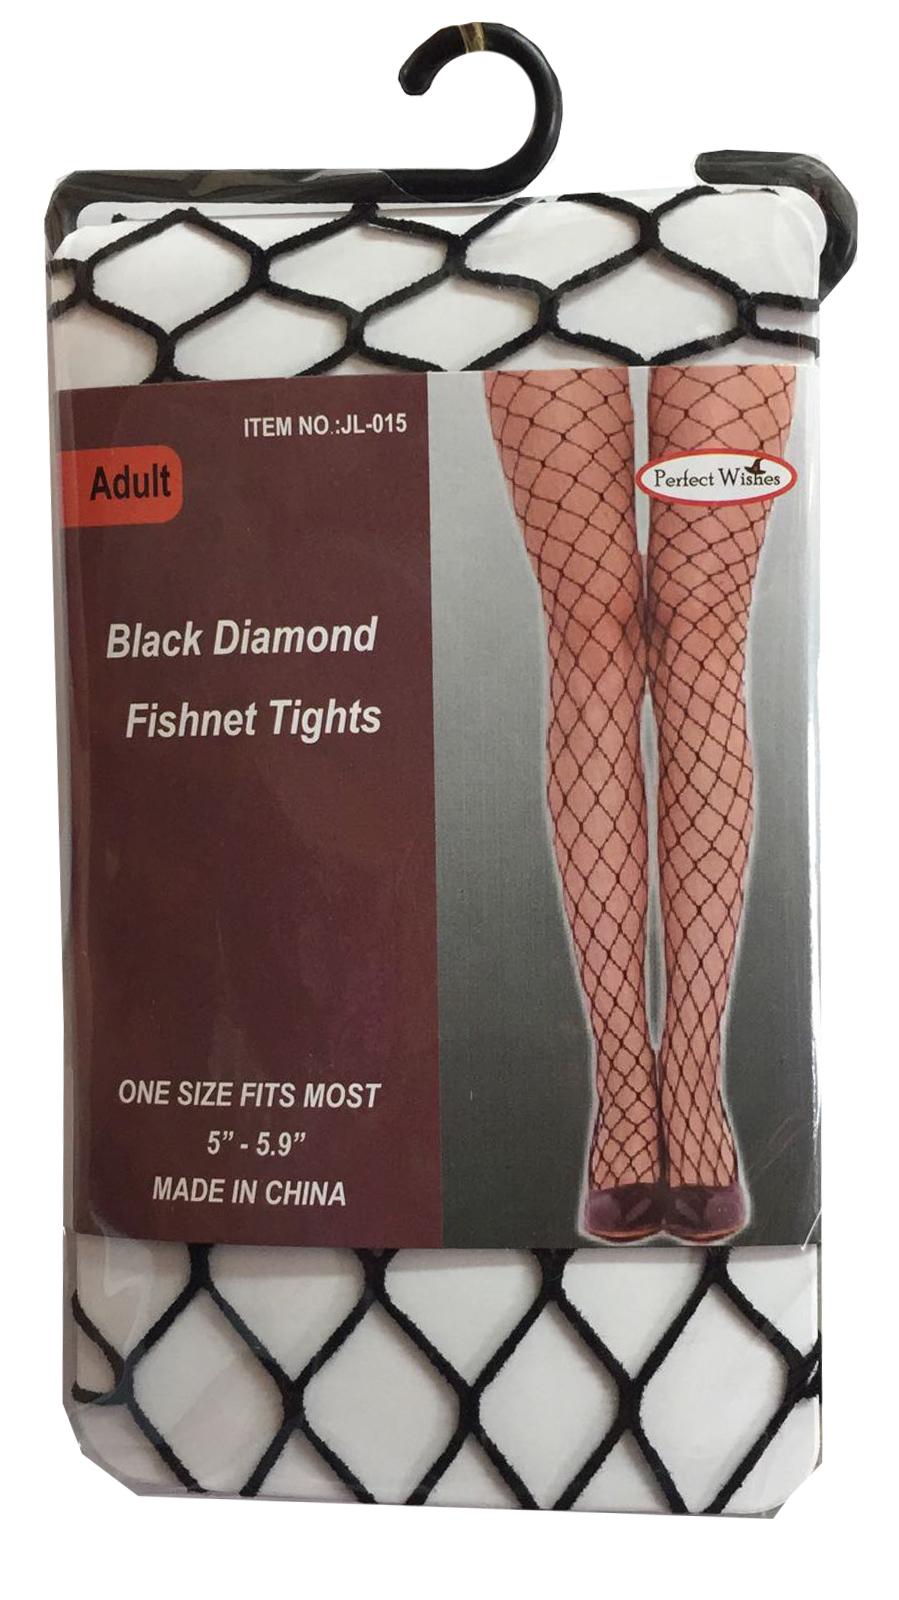 Black Diamond Fishnet Tights